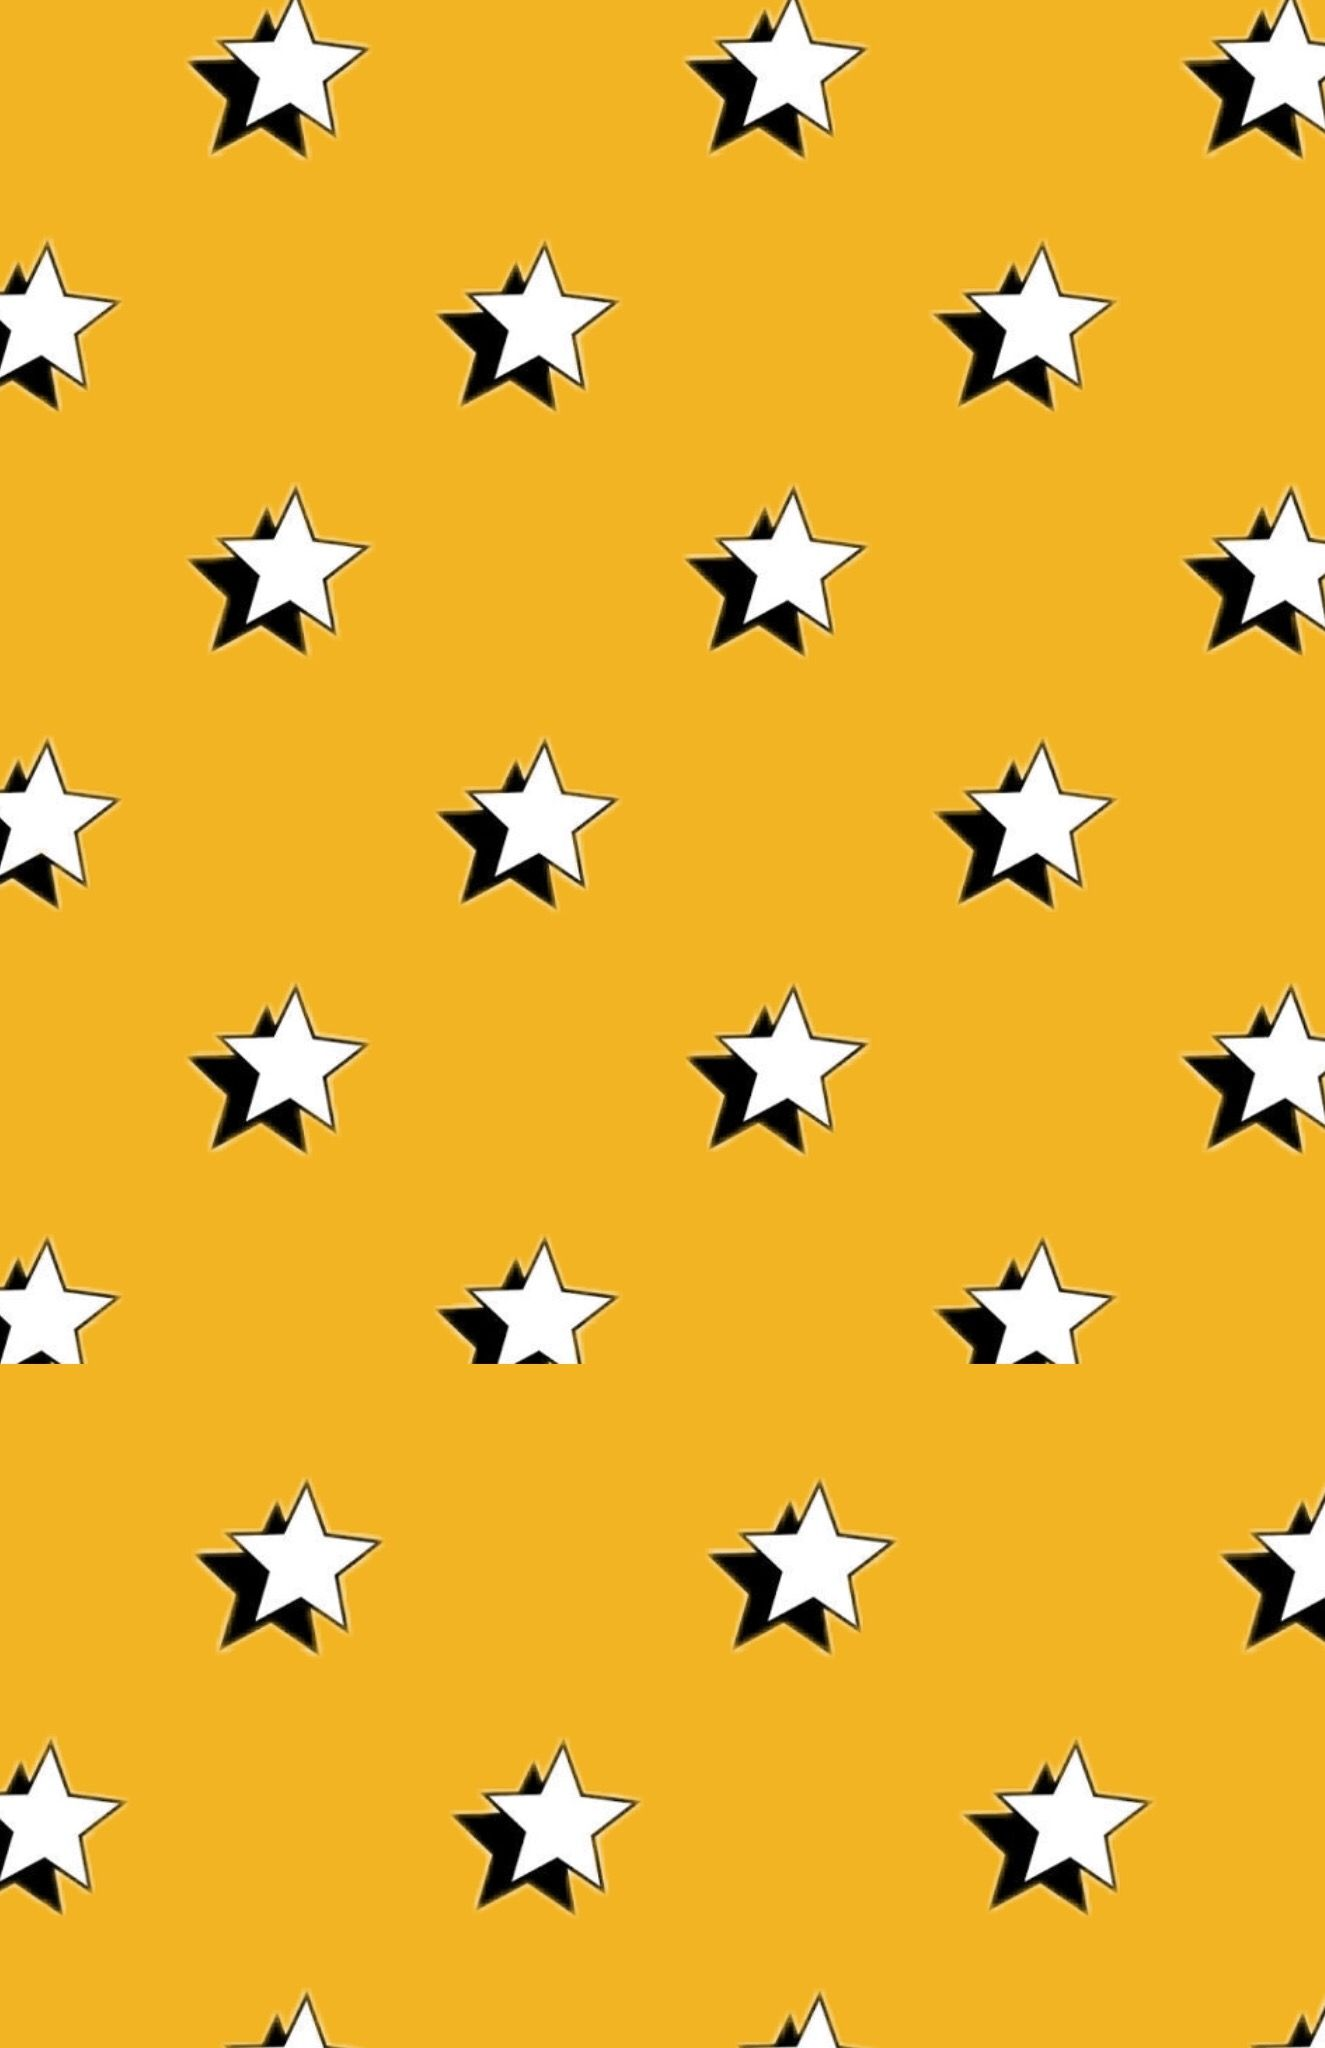 Pin by jayli waznik on from my camera roll Cute patterns